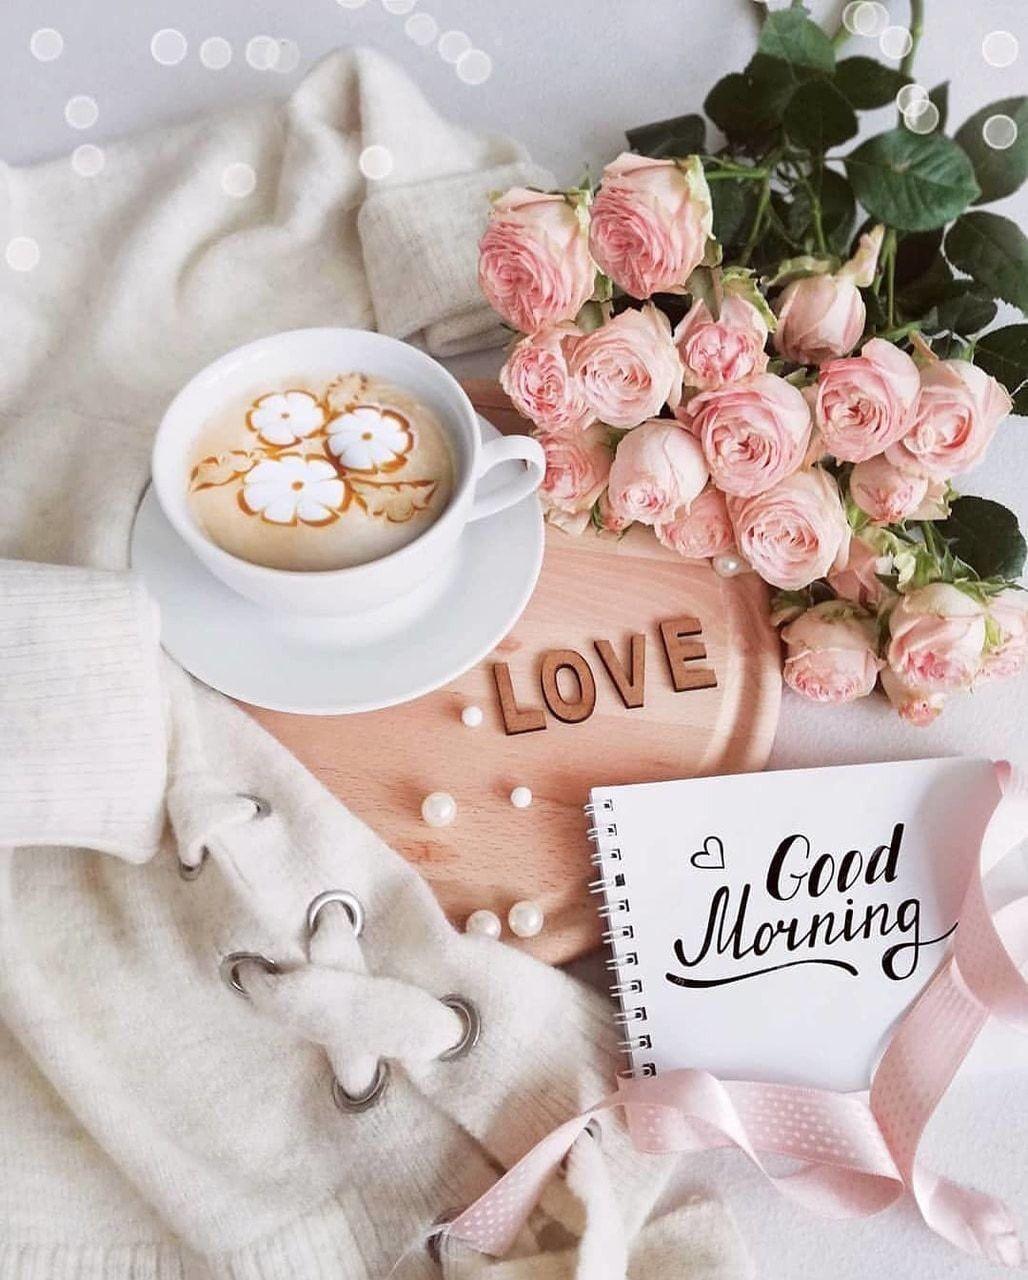 Janice on Twitter | Good morning coffee, Good morning images, Good morning  beautiful